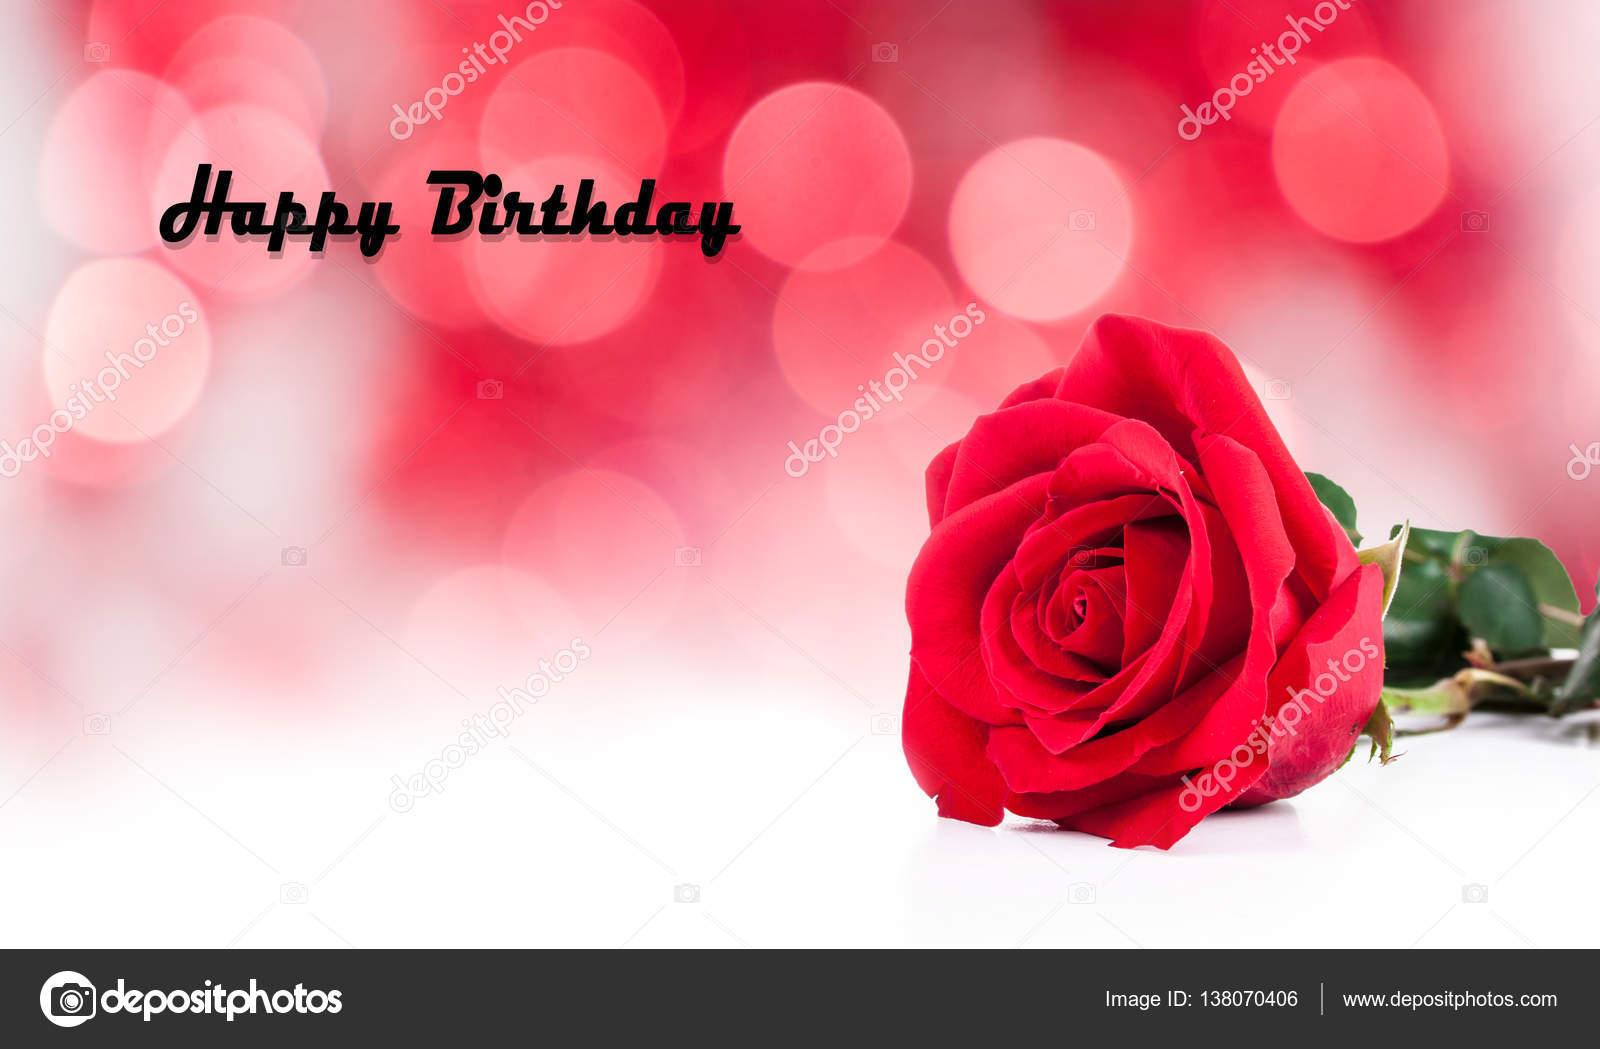 geburtstagskarten mit roten rosen stockfoto ketta 138070406